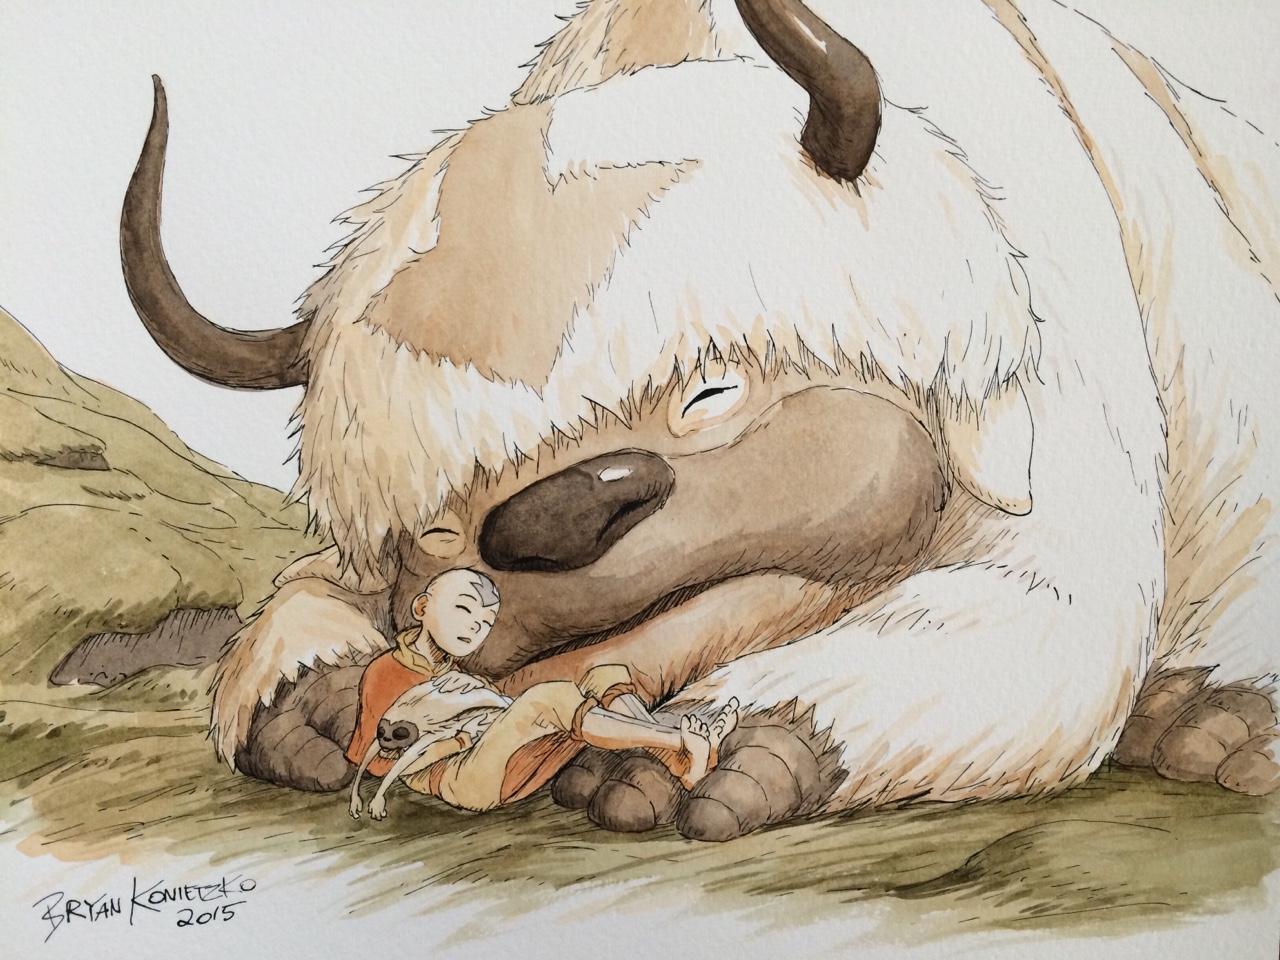 Appa Aang And Momo By Bryan Konietzko